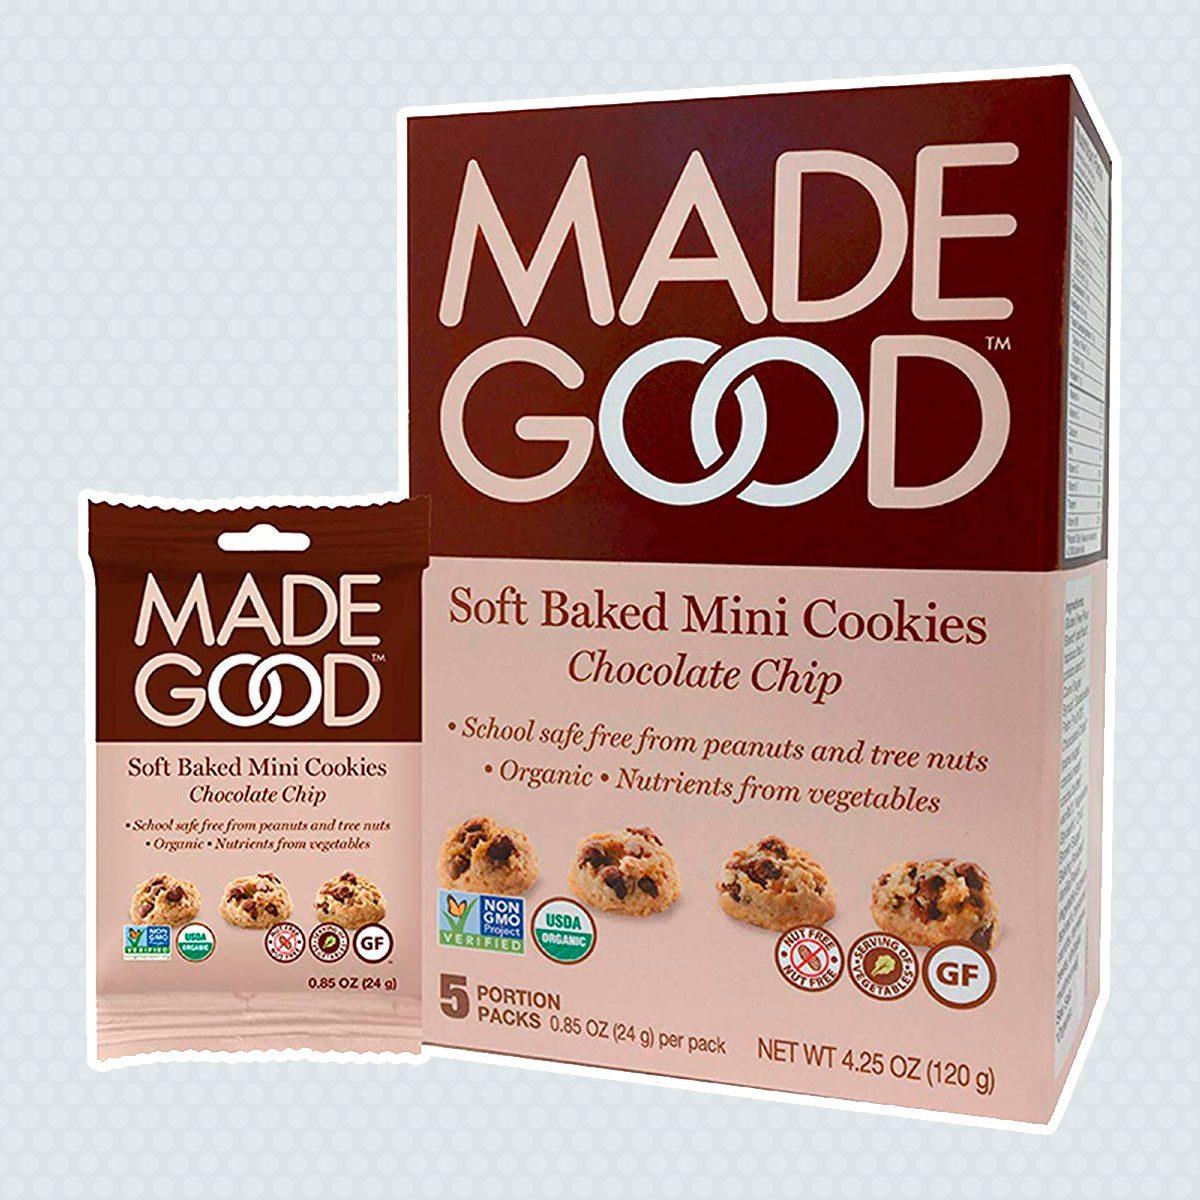 Made Good Mini Chocolate Chip Cookies